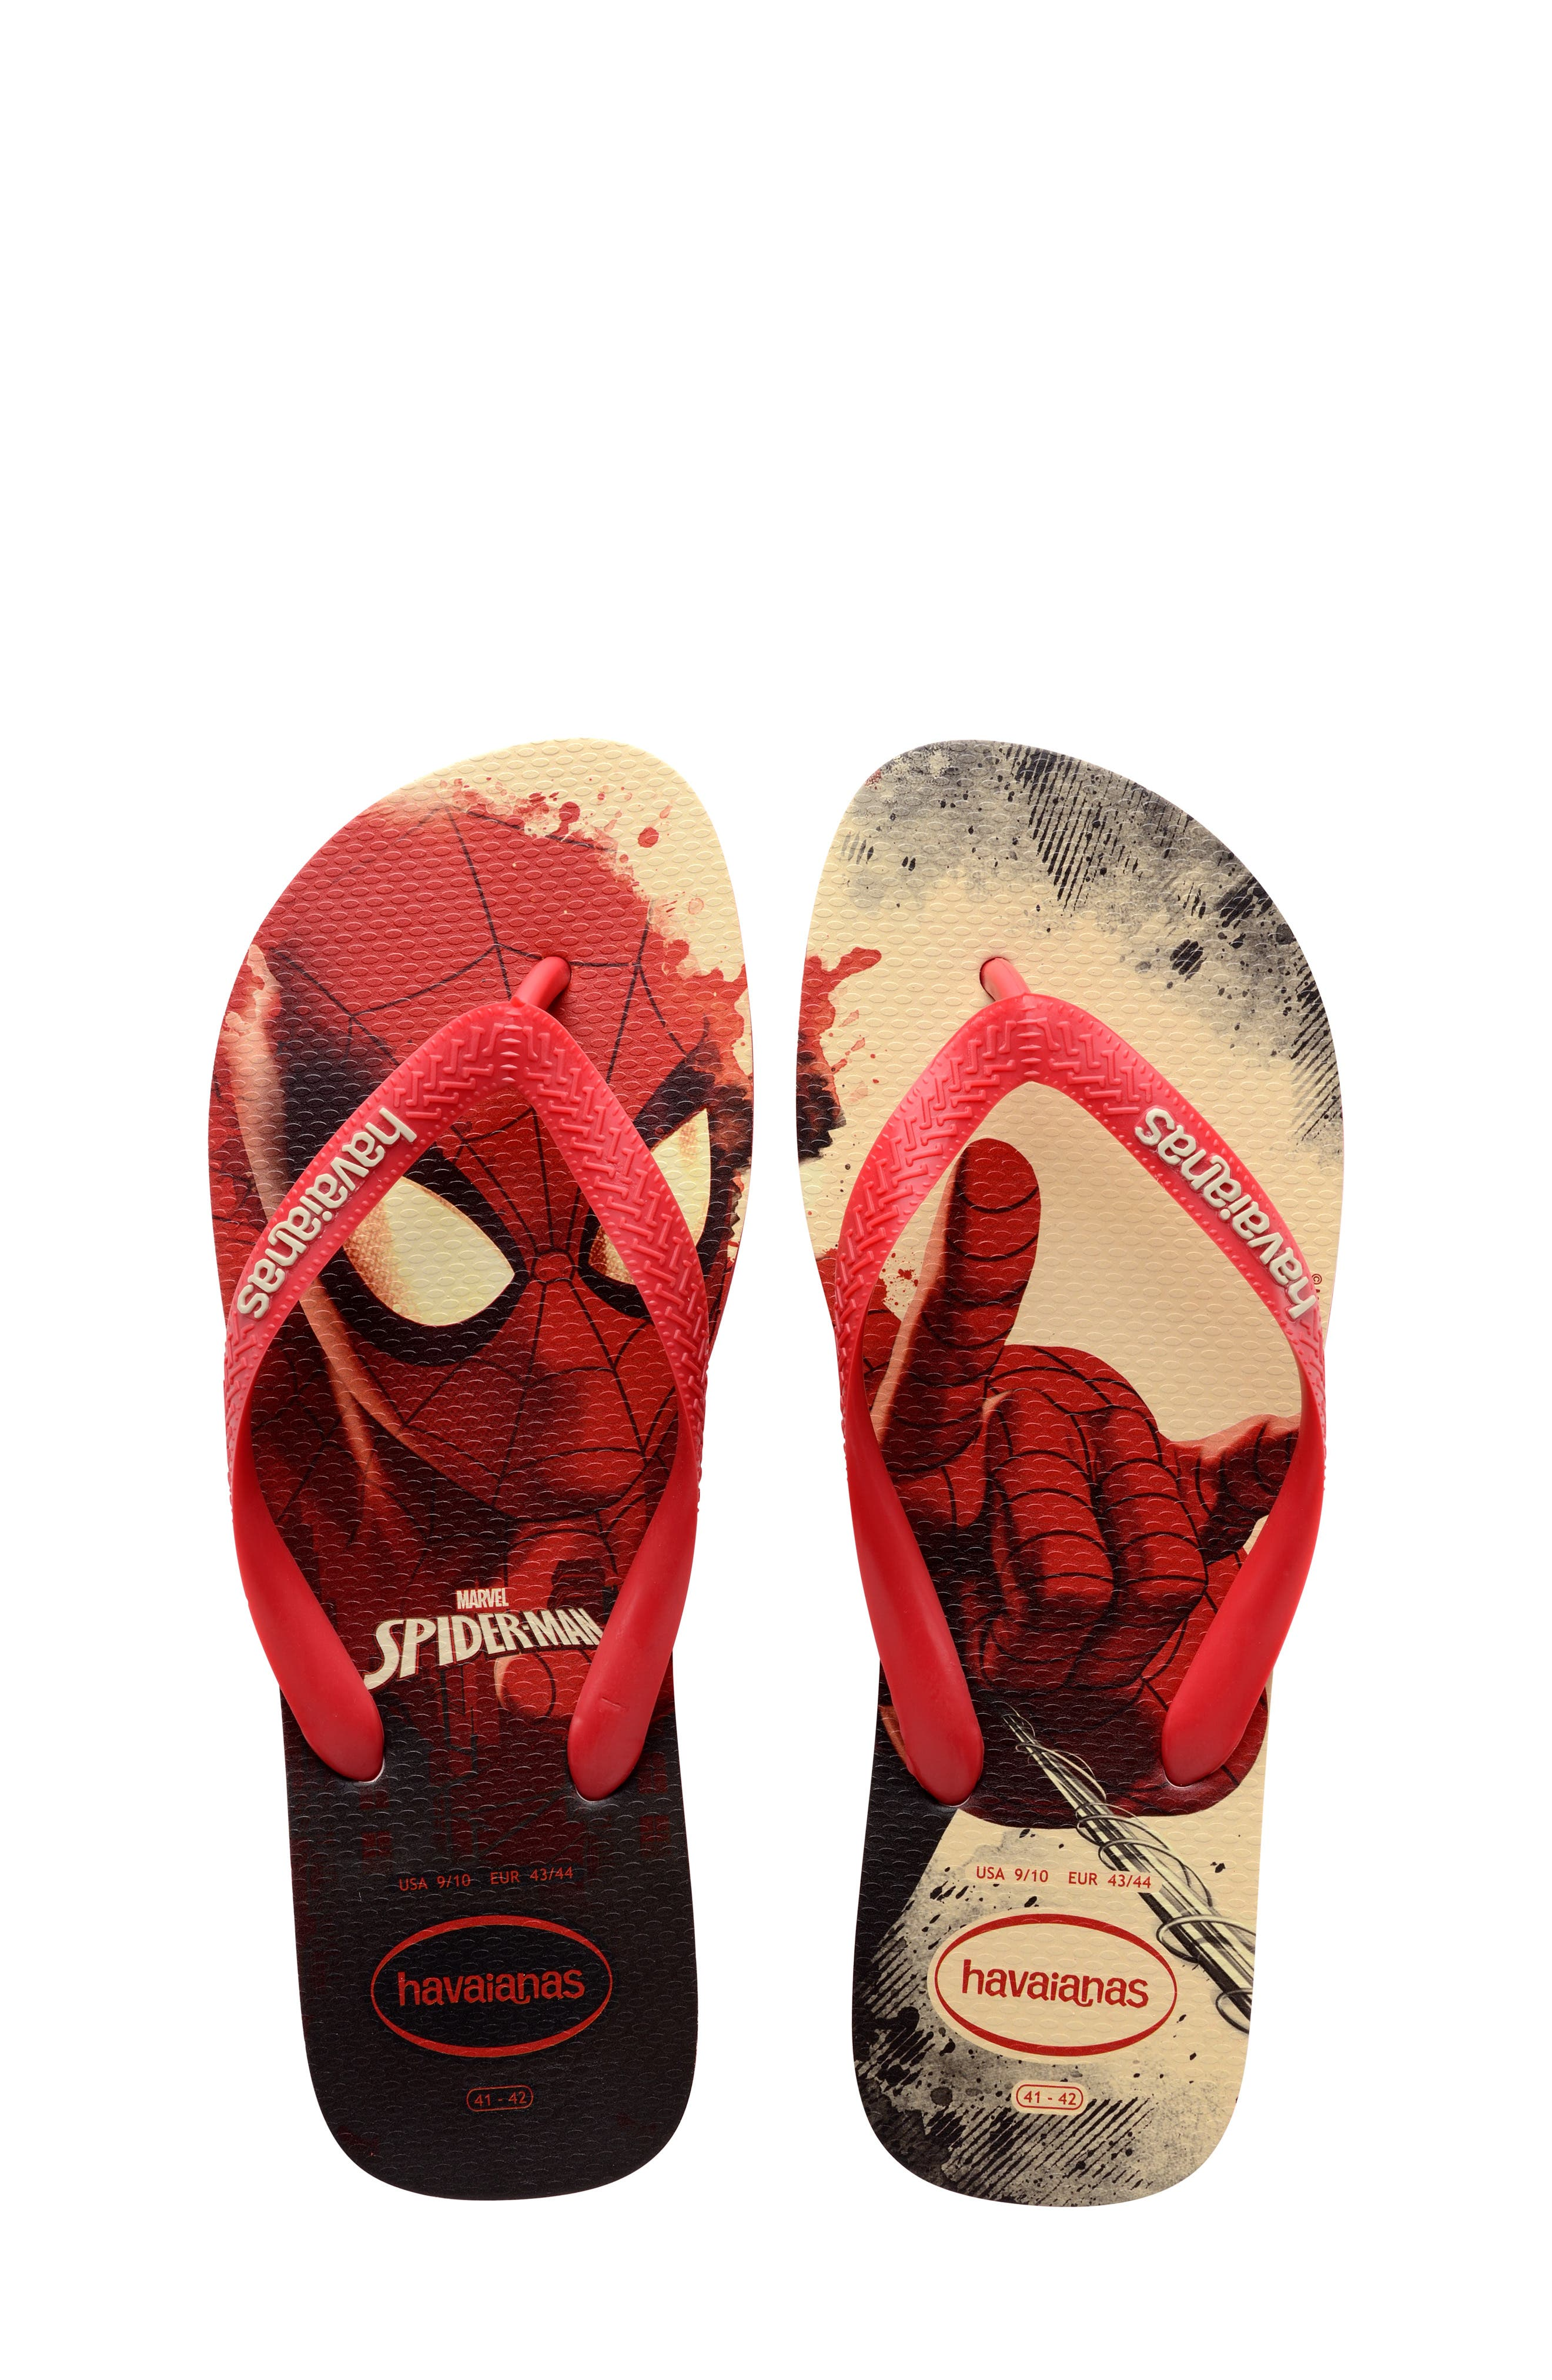 Boys' Sandals: Flip-Flop, Waterproof